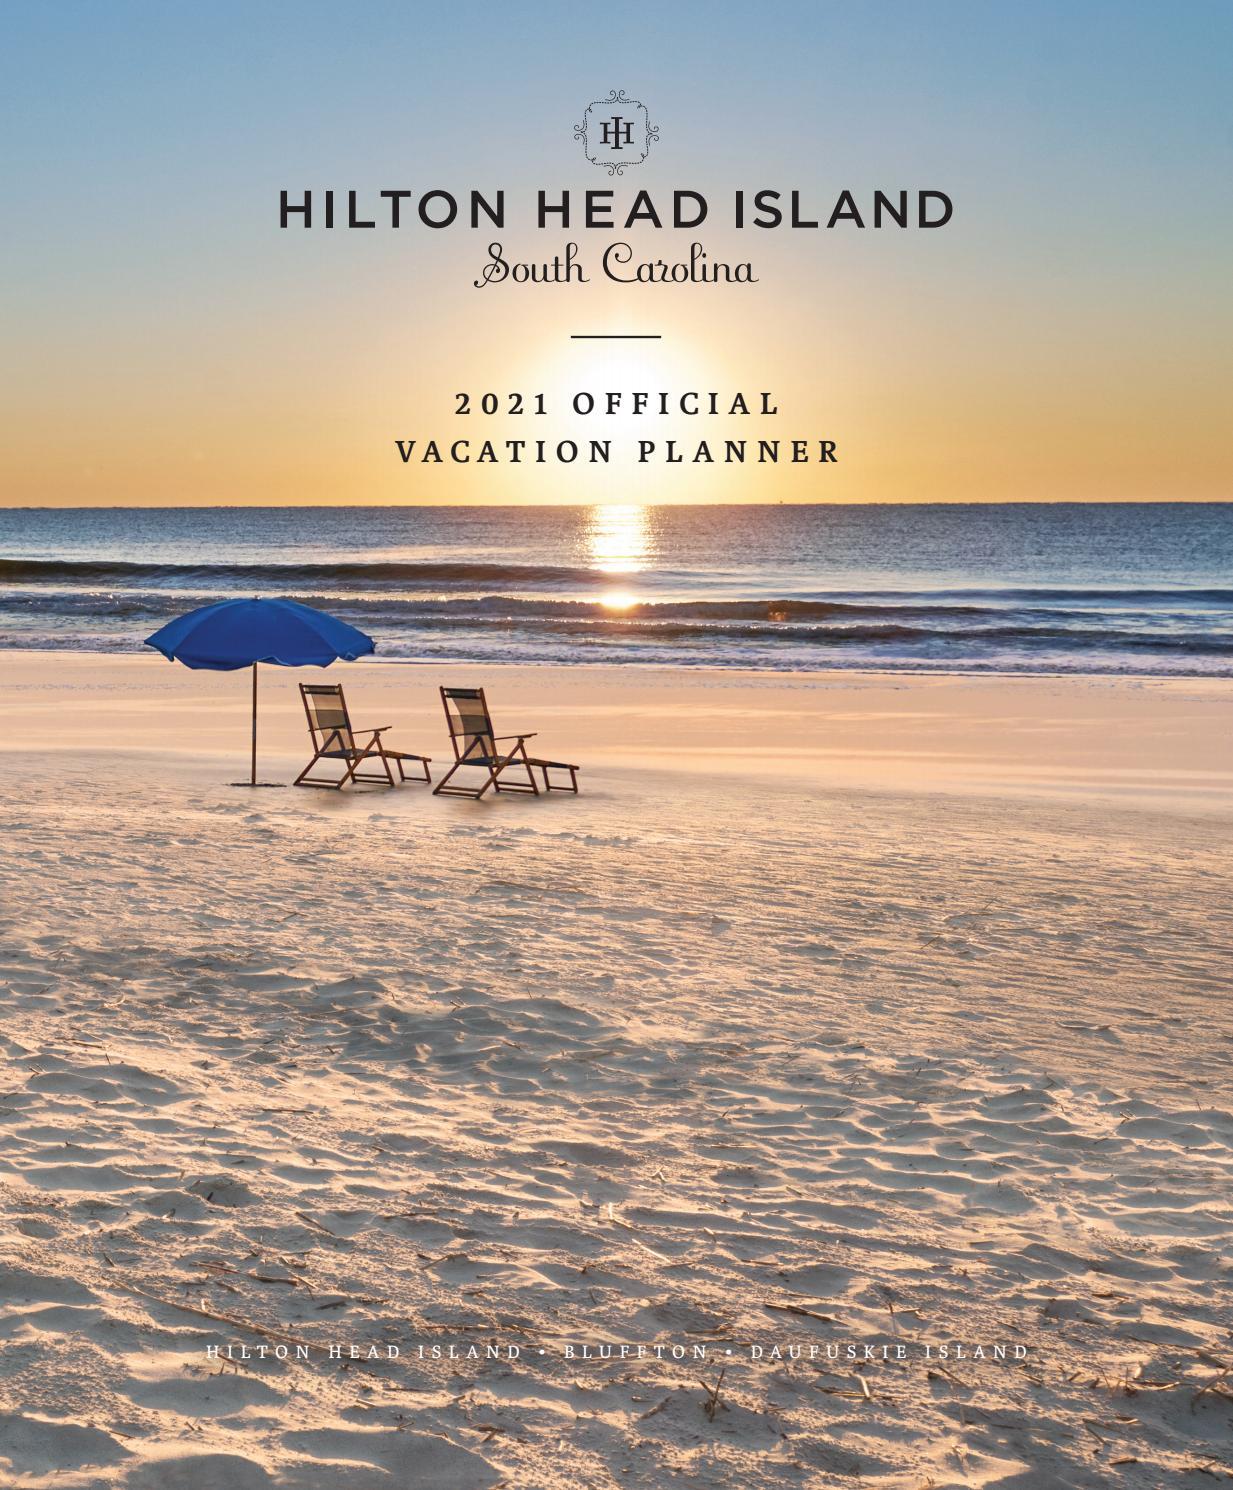 Hilton Head Christmas 2021 Caterers Hilton Head Island Bluffton 2021 Vacation Planner By Hilton Head Island Bluffton Vcb Issuu